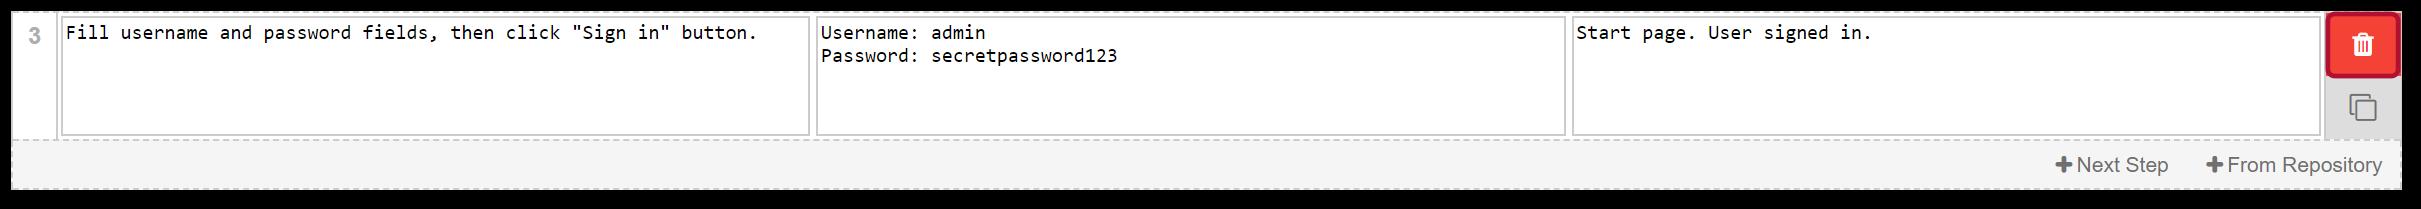 TestFLO Cloud: Delete Step